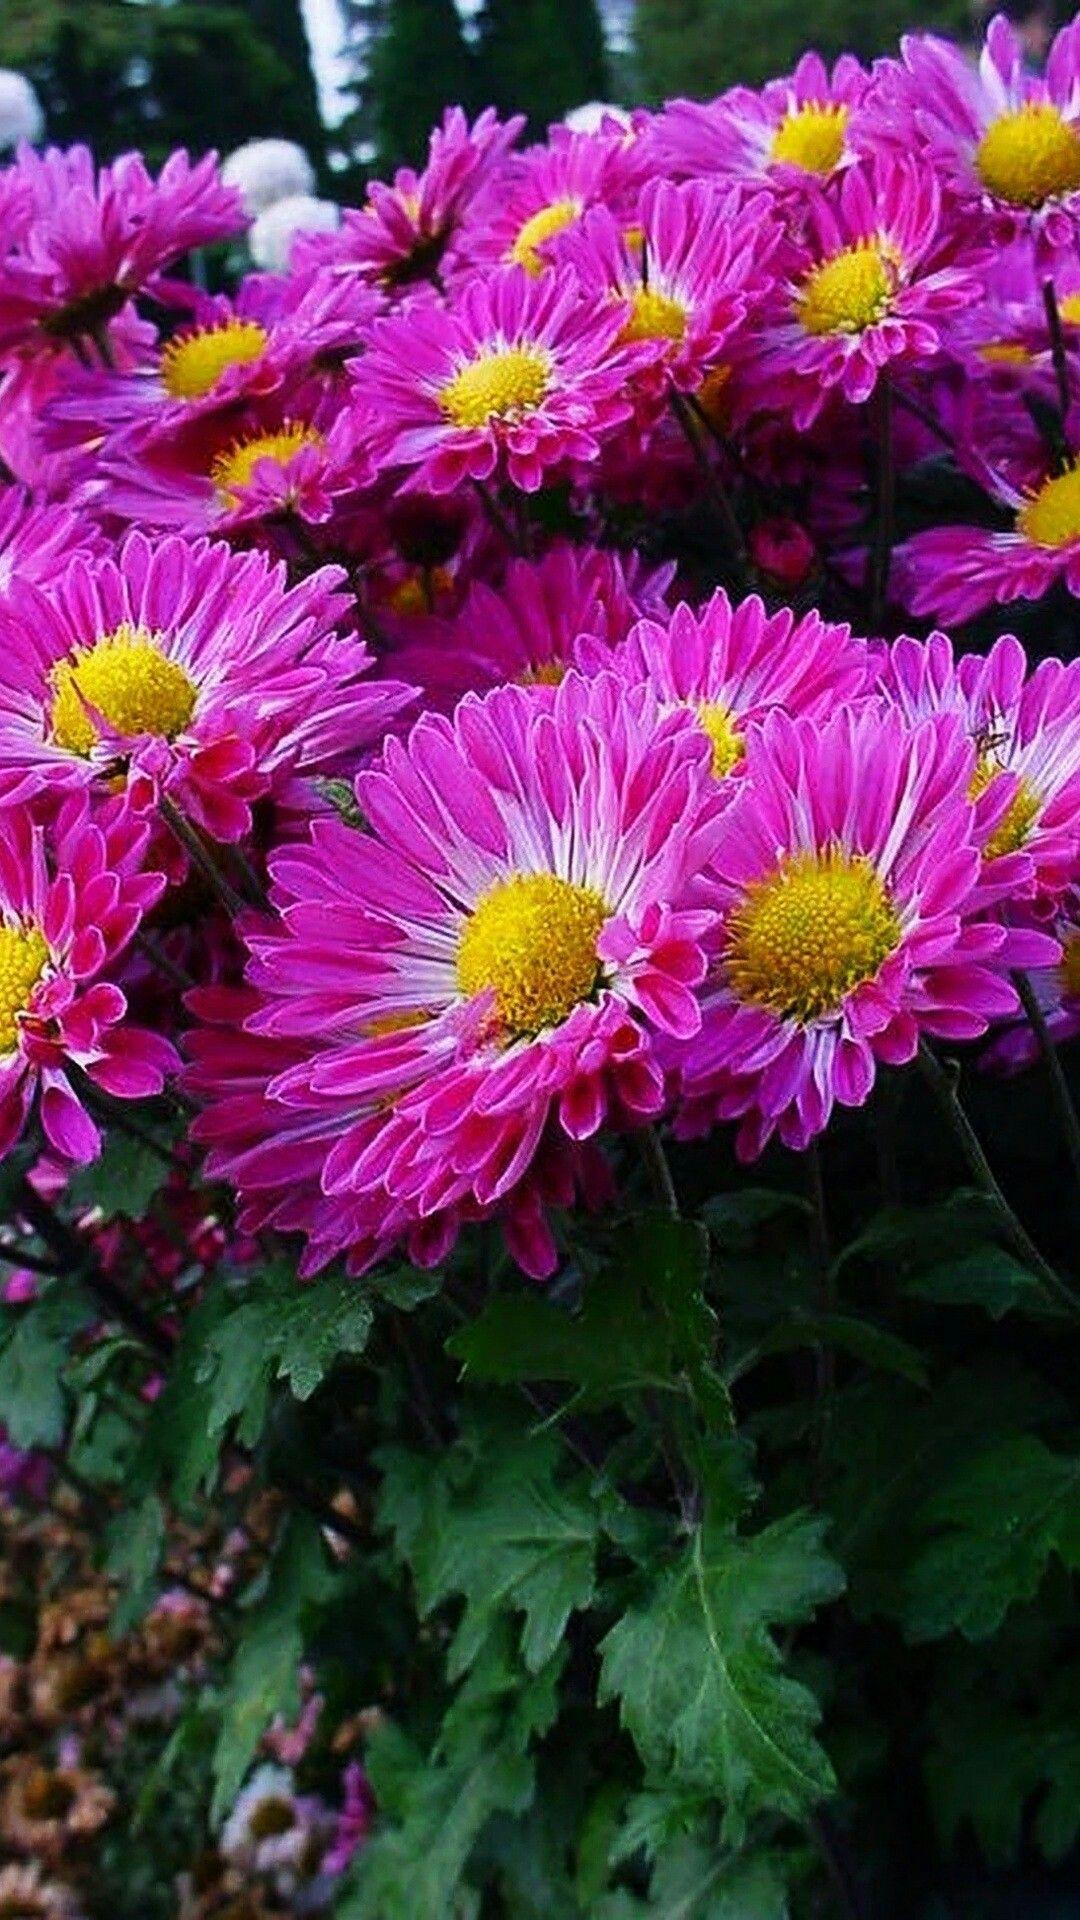 Pin by carolyn mangler on flowers i like pinterest flowers